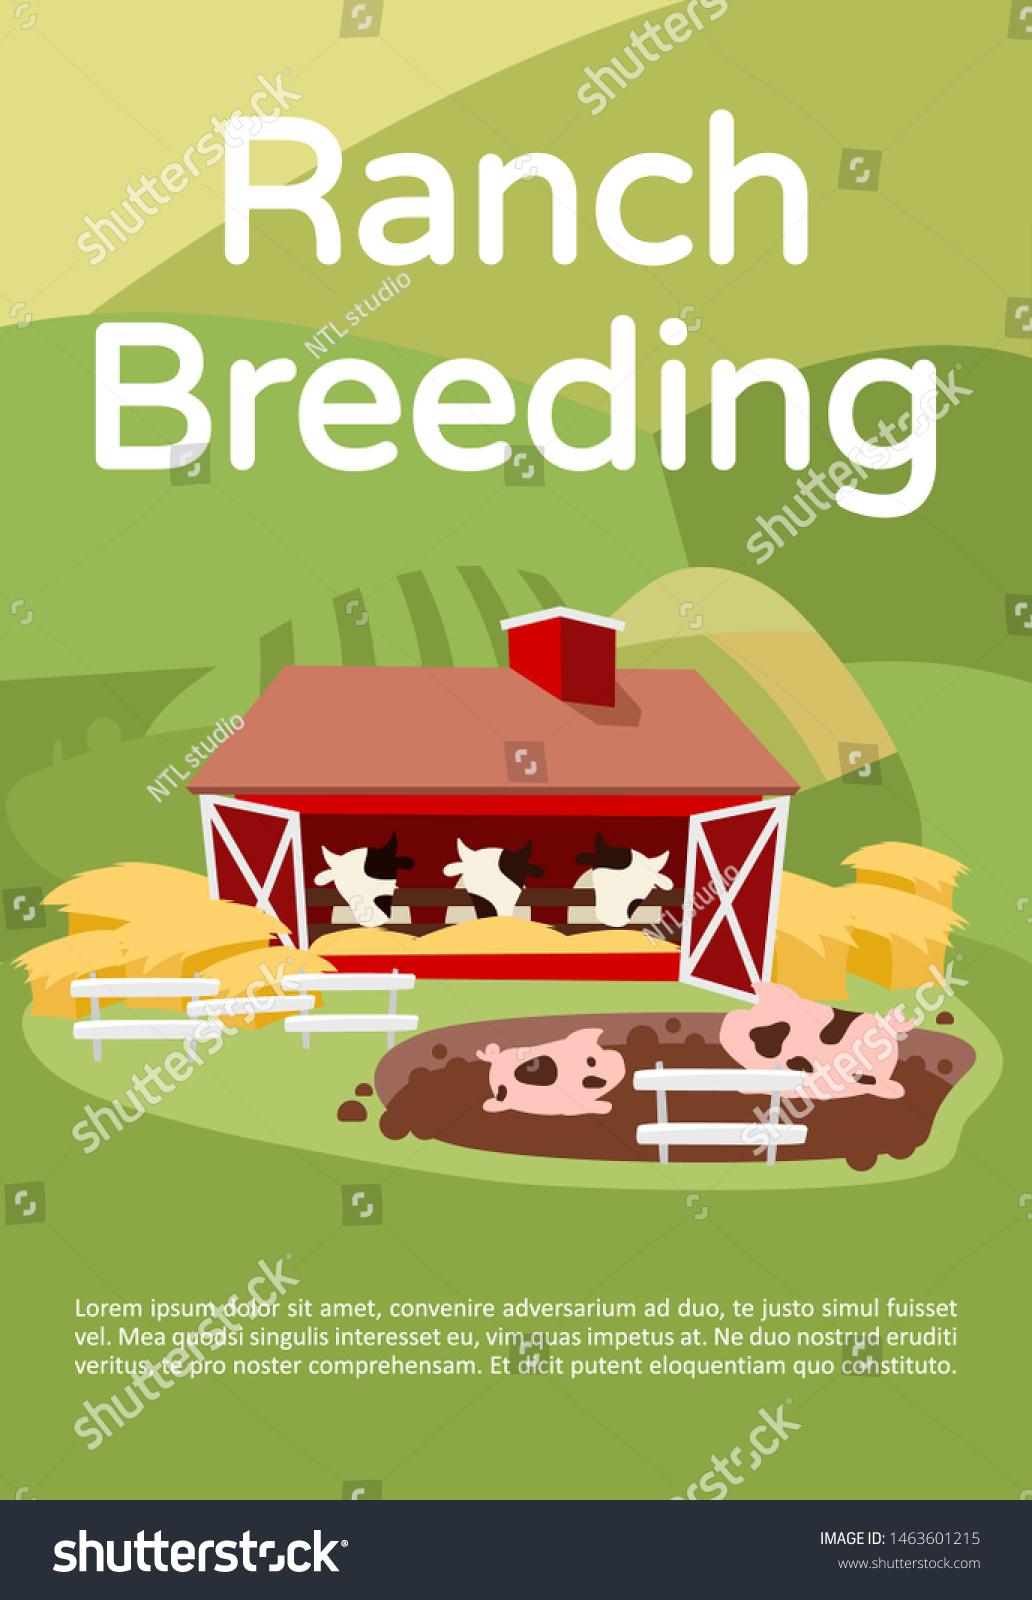 Ranch Breeding Brochure Template Livestock Cattle Stock ... on